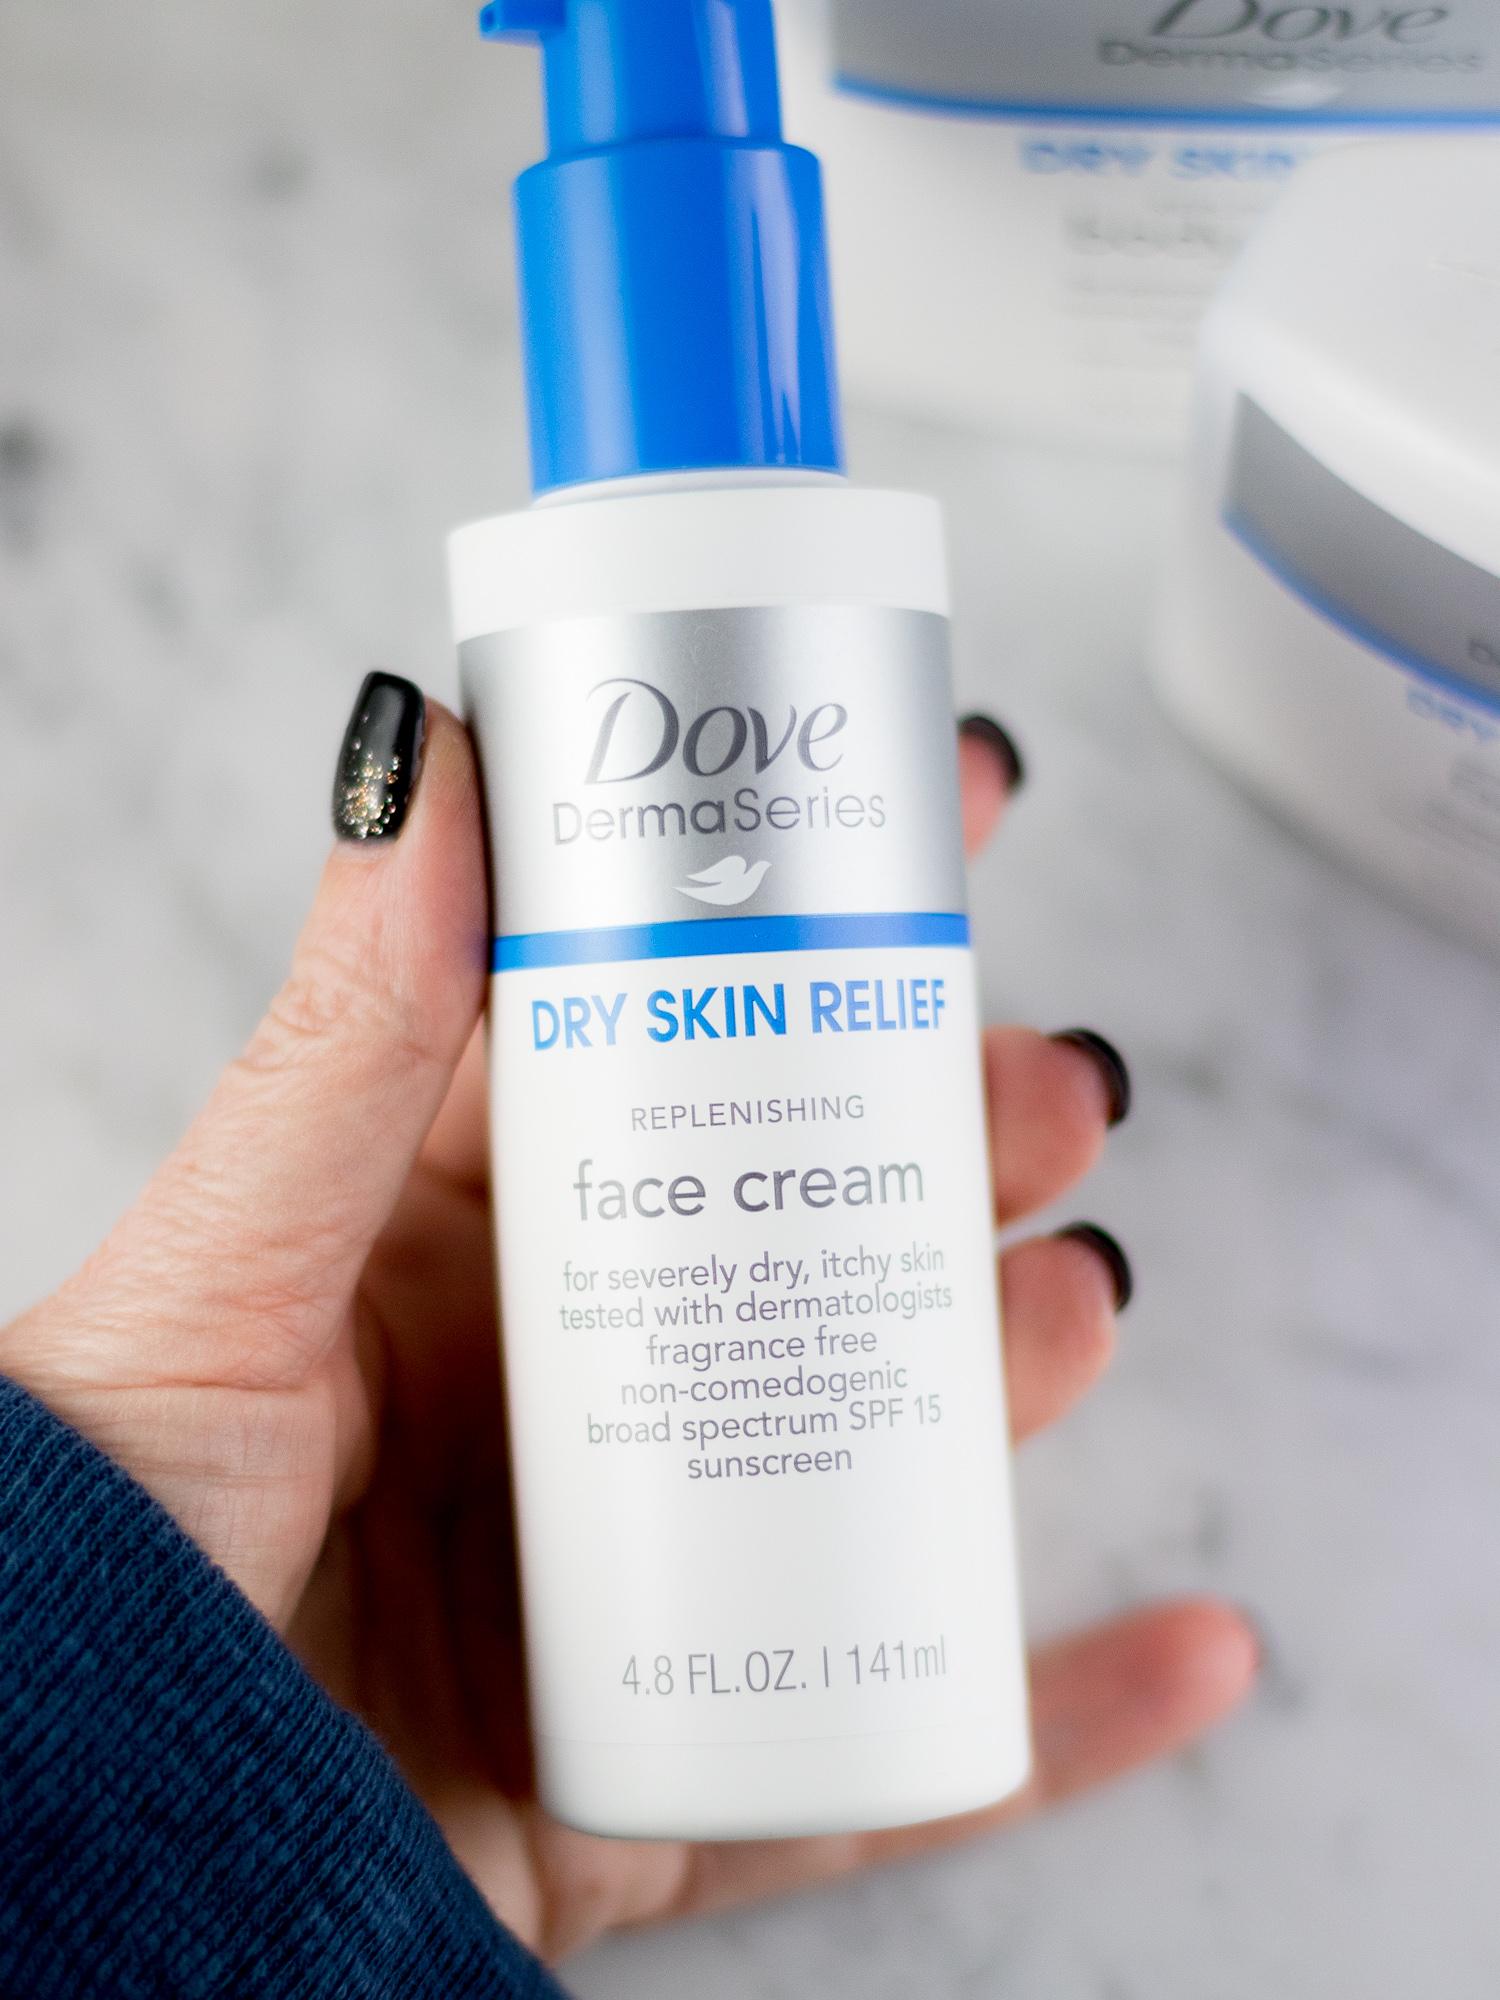 Dove DermaSeries Replenishing Face Cream